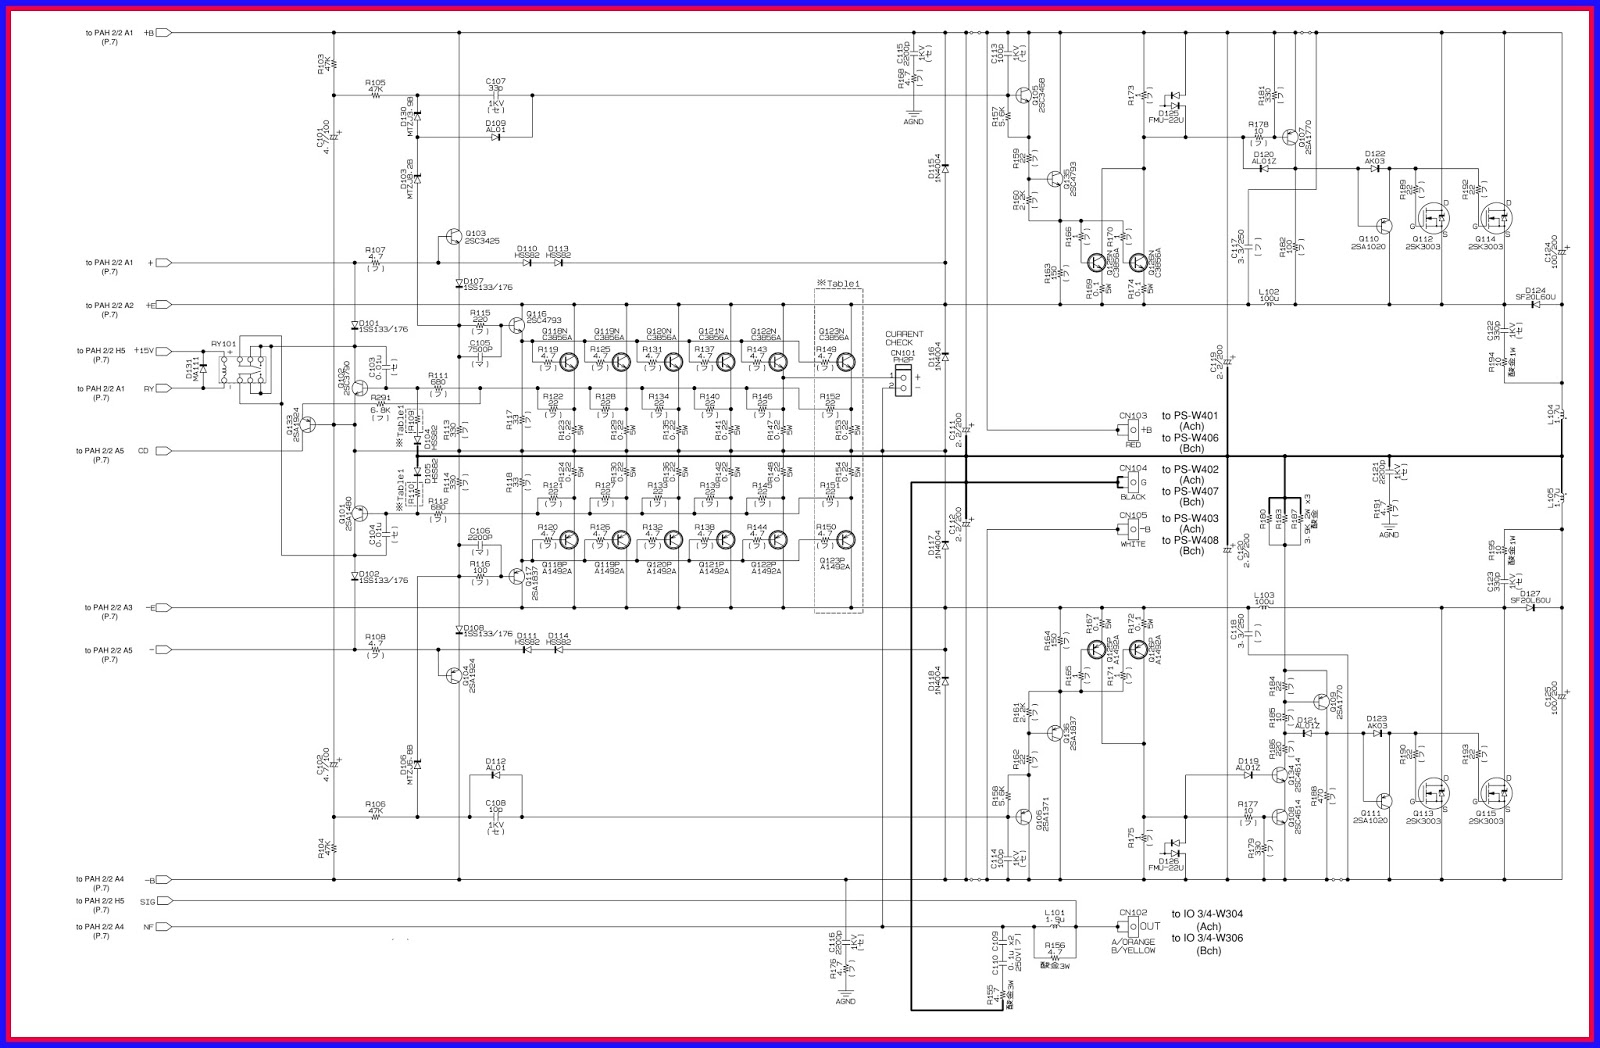 medium resolution of yamaha amp schematic wiring diagram technicyamaha amp schematic wiring diagram insideyamaha amp schematic wiring diagram expert